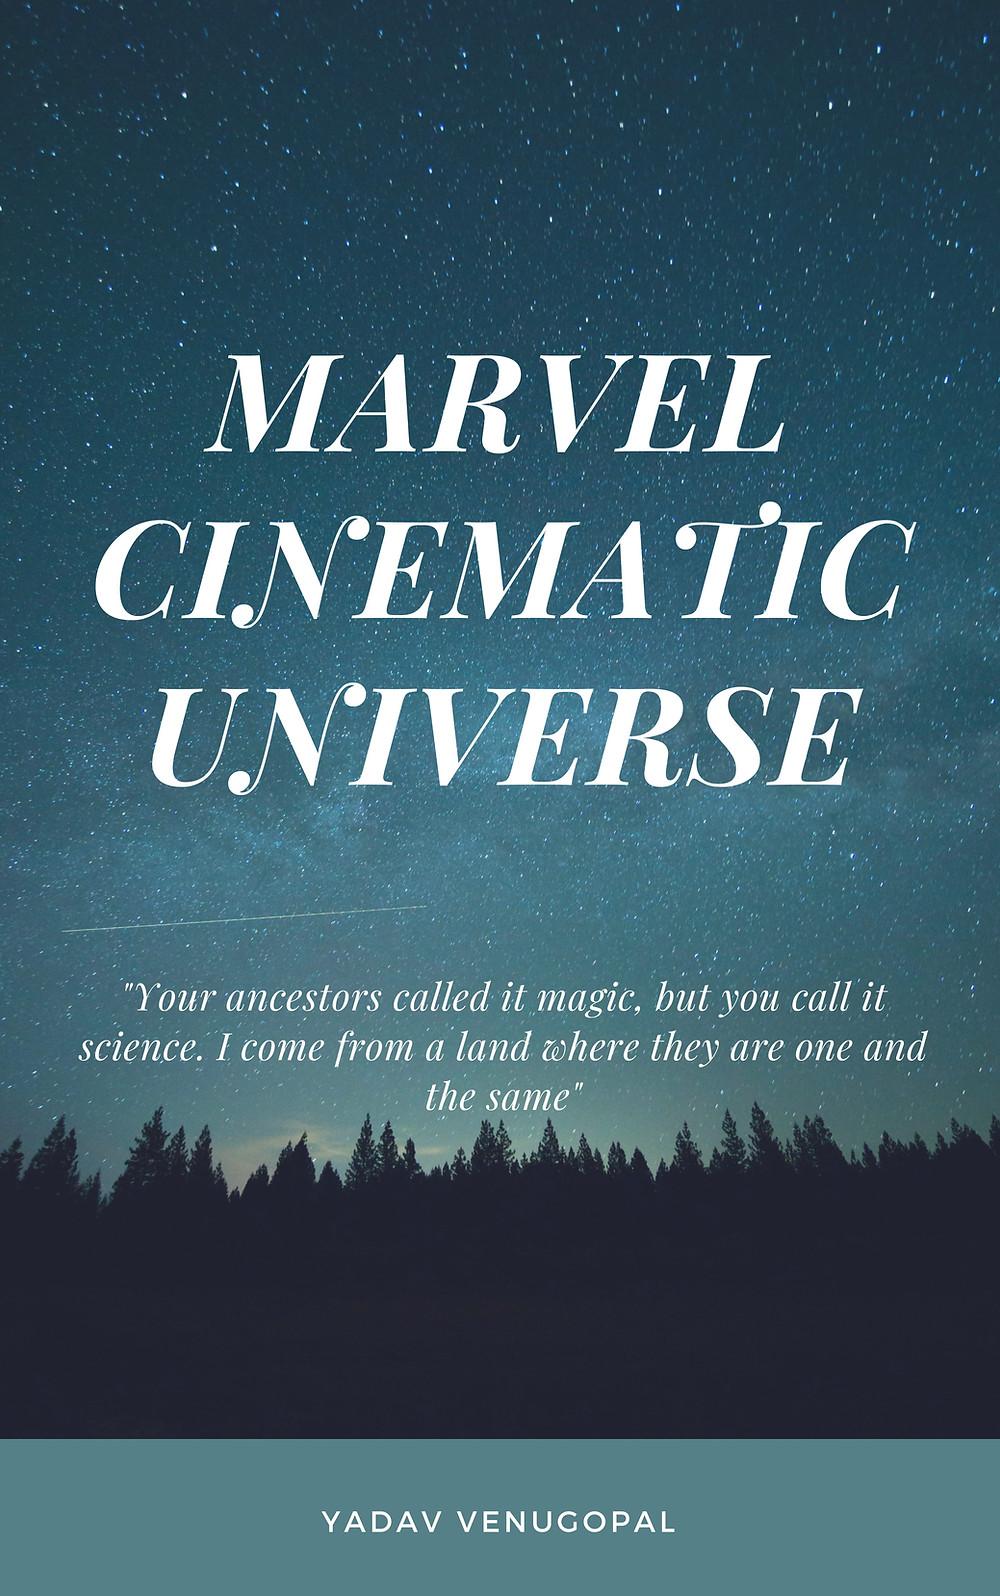 Marvel Cinematic Universe Quote Art - Yadav Venugopal